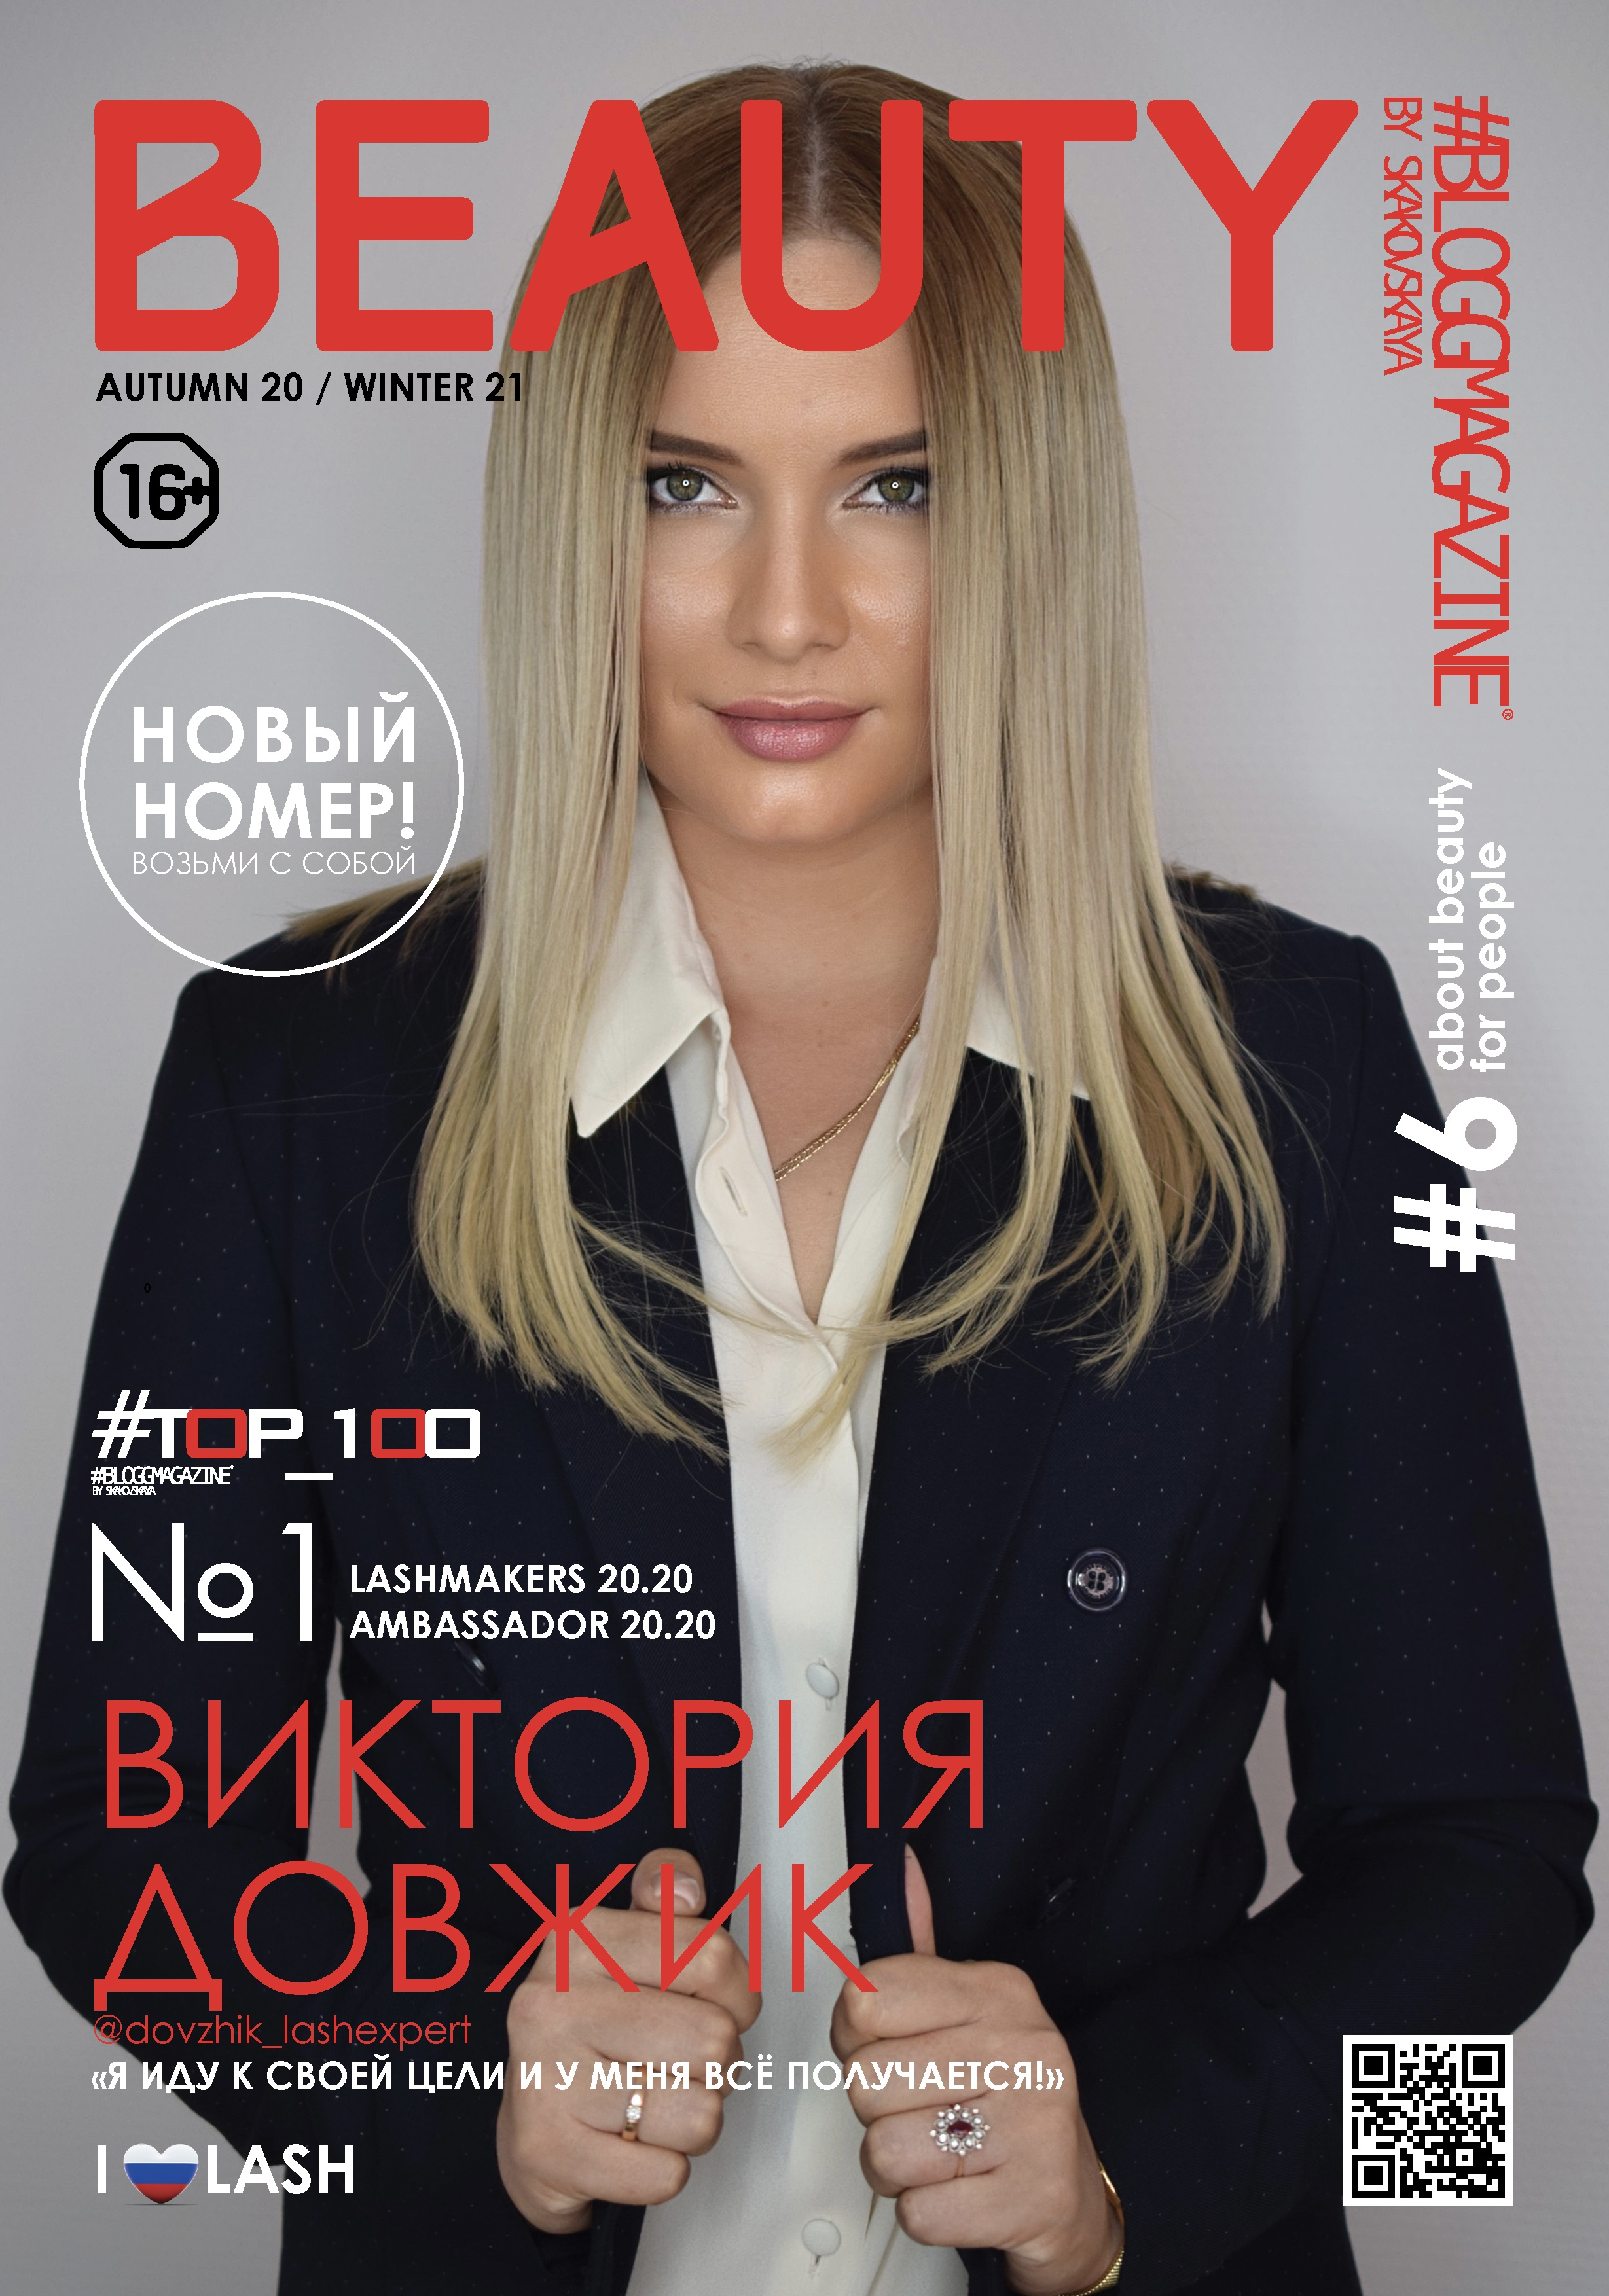 beauty_bloggmagazine_dovzhik_lashexpert.